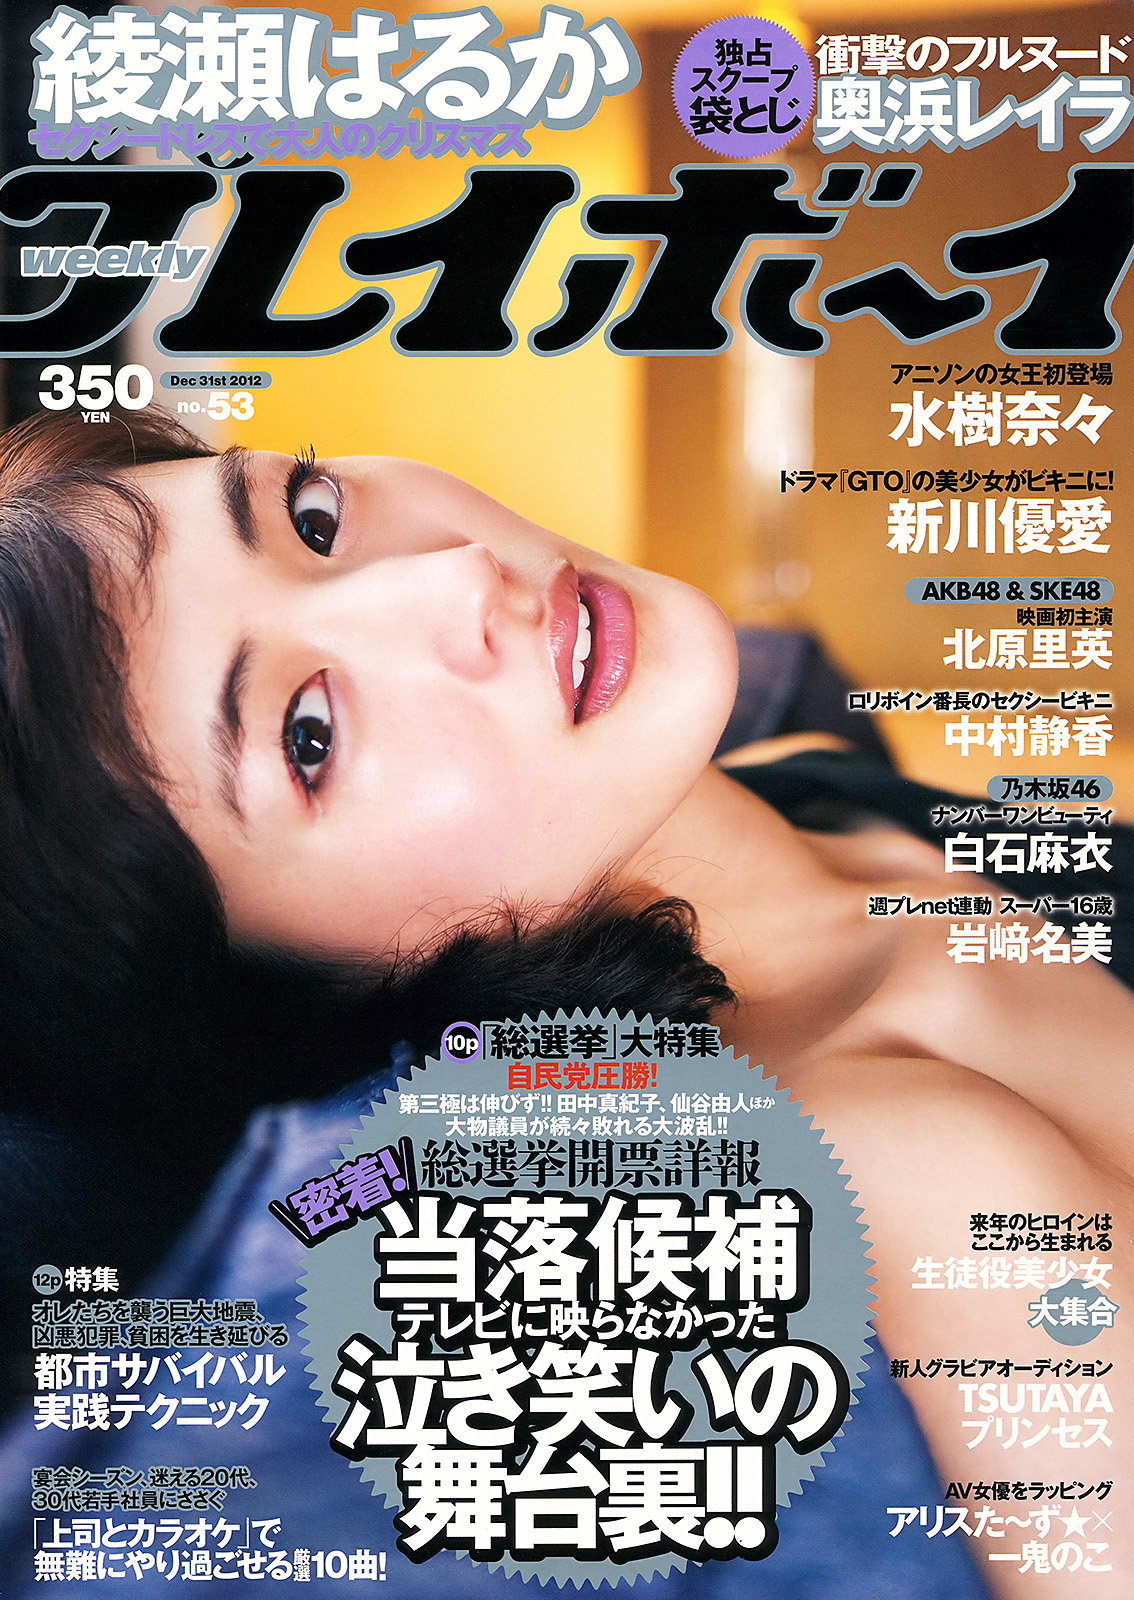 Ayase Haruka en la Weekly Playboy Magazine (2012 No.53)